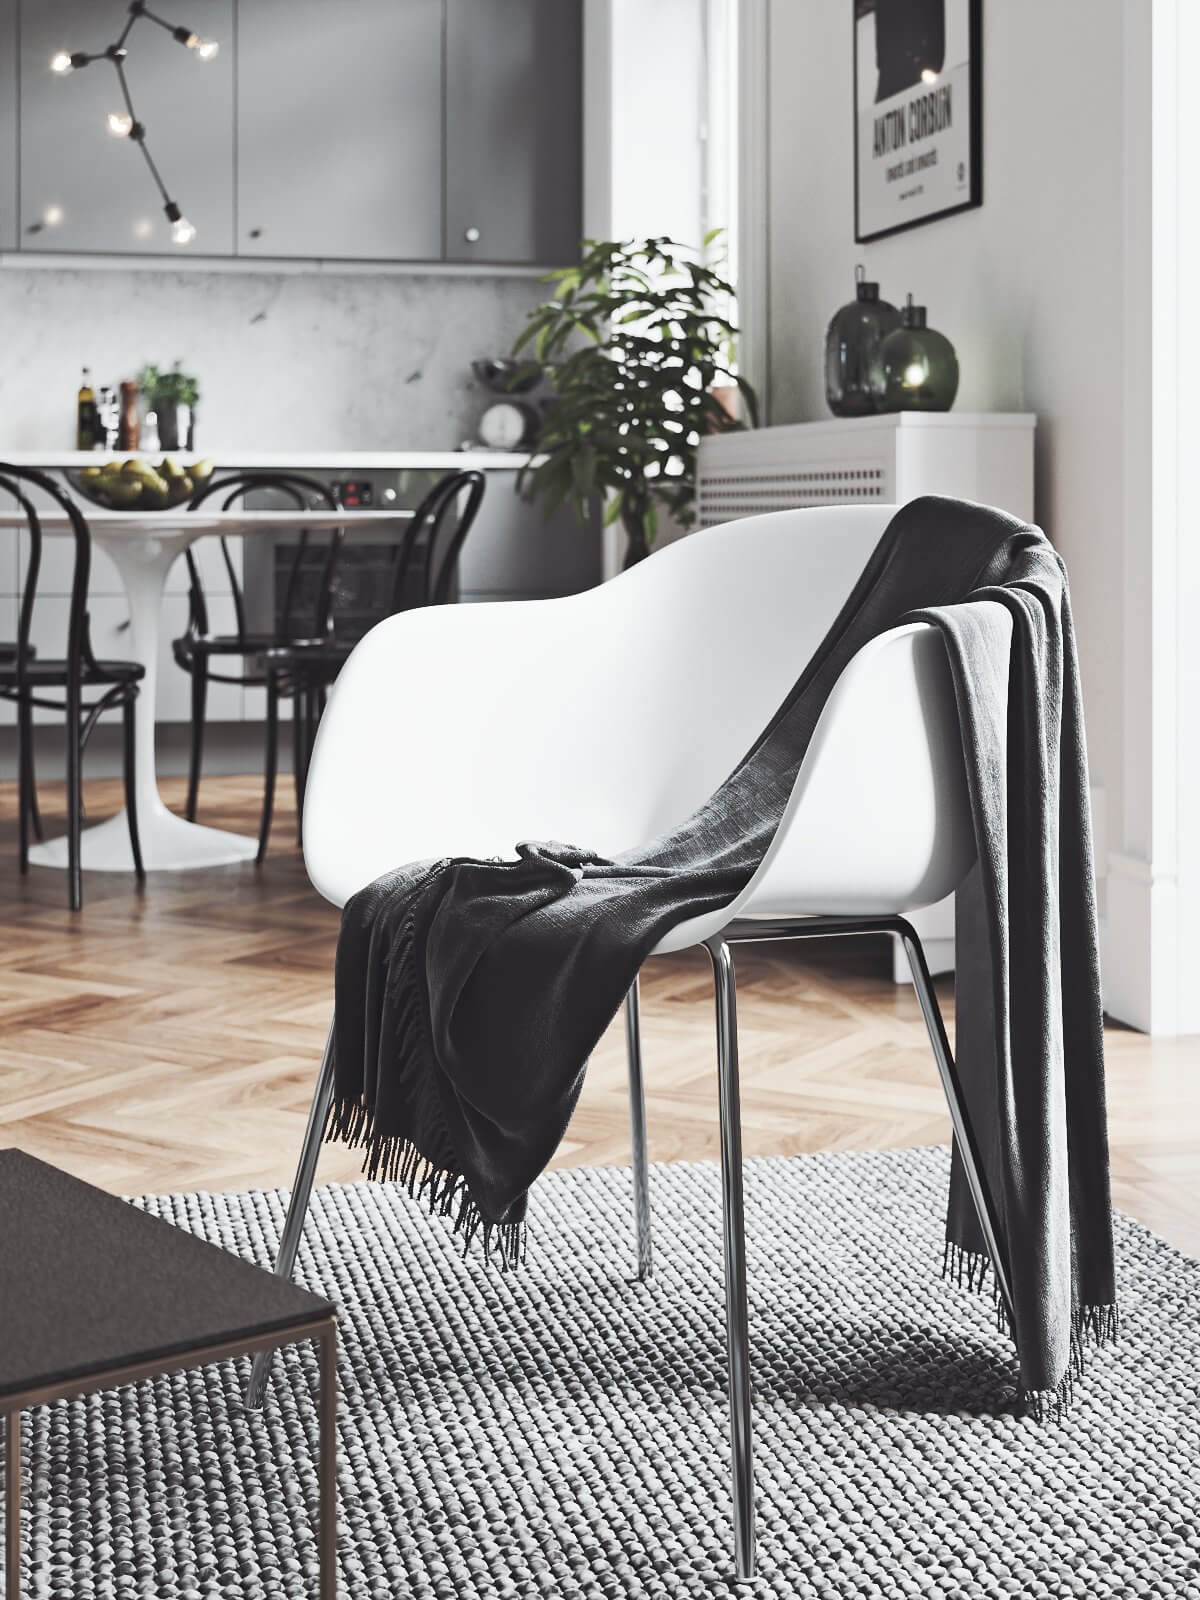 Scandinavian flat detail chair blankets 2- cgi visualization